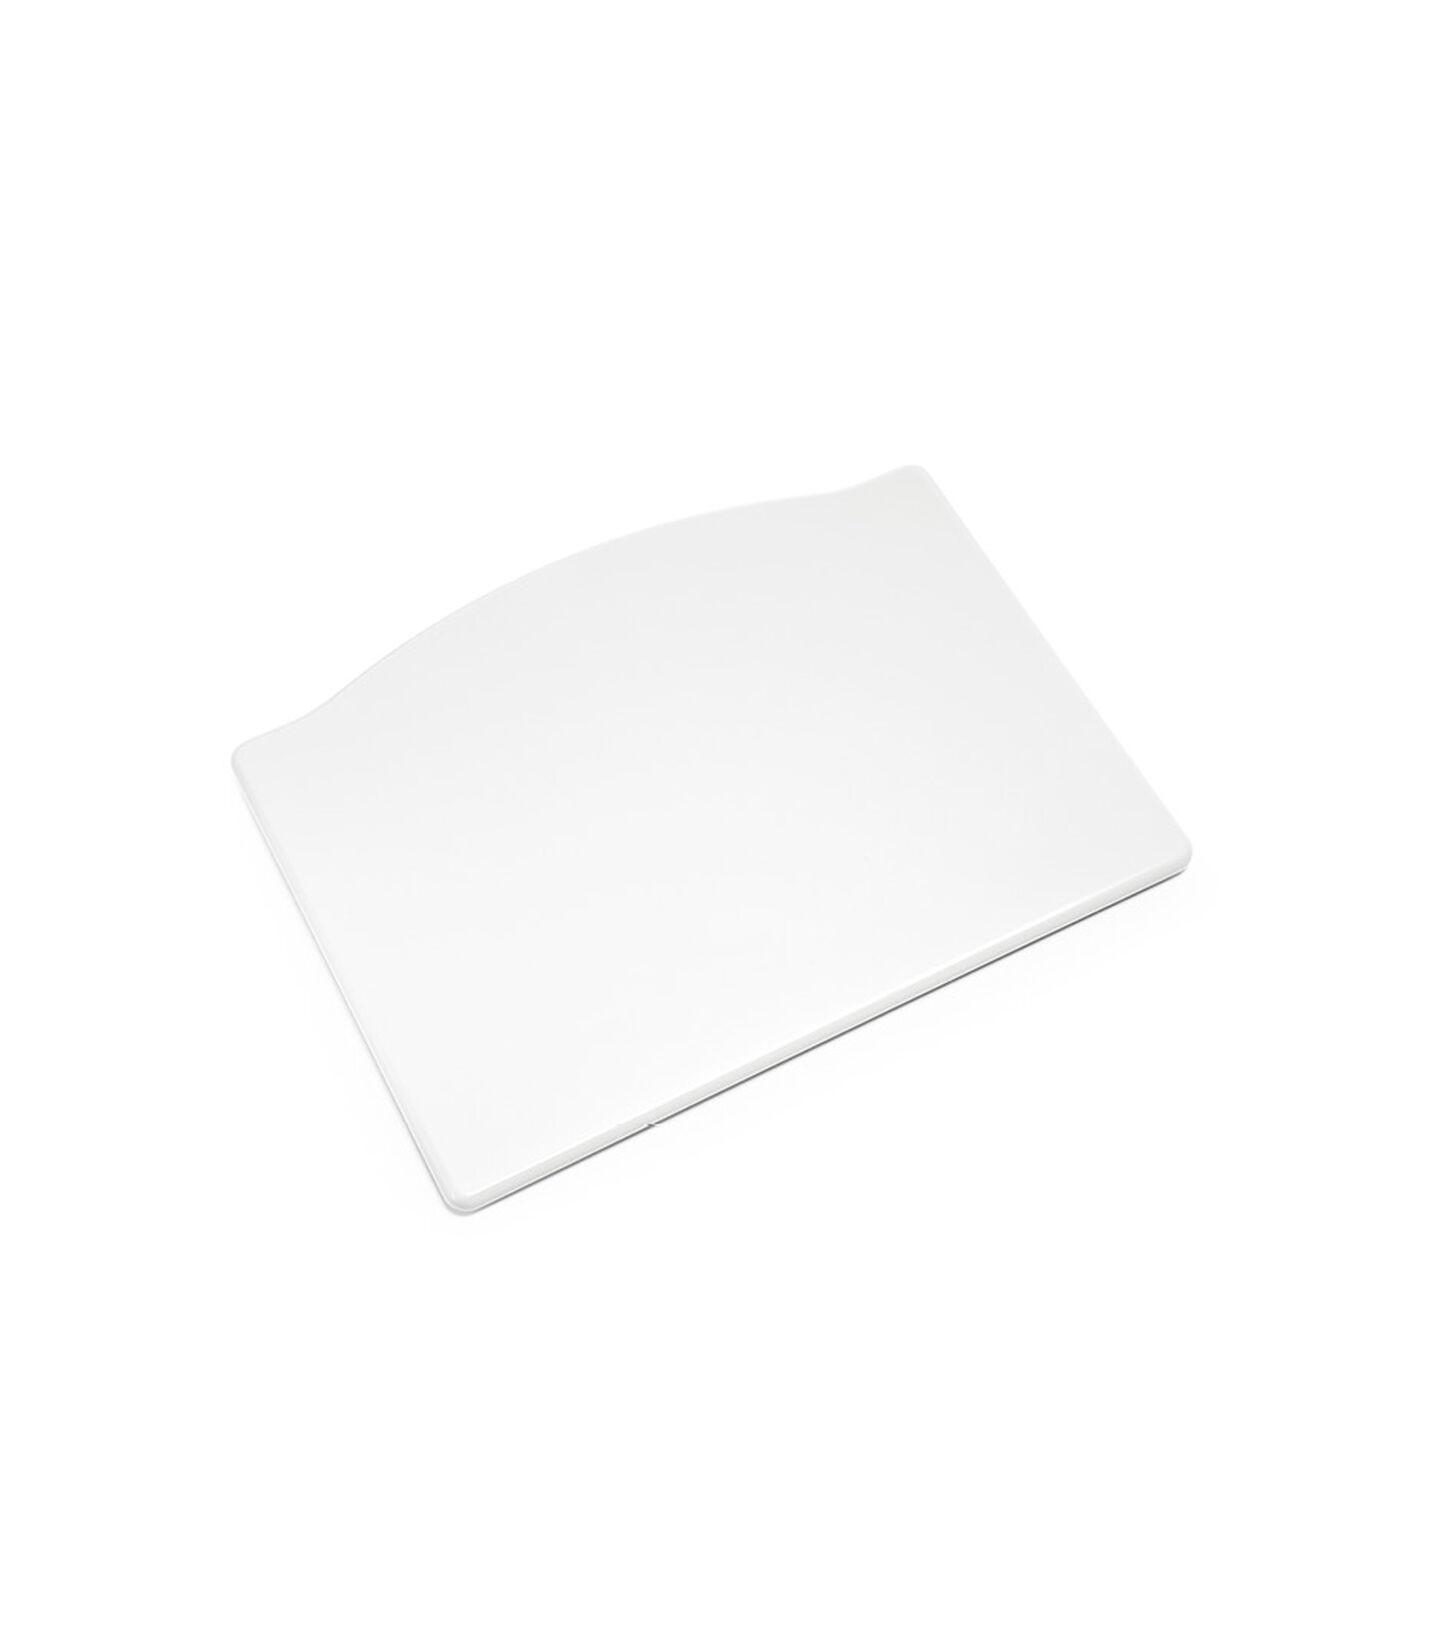 Tripp Trapp® płyta podparcia stóp White, White, mainview view 1